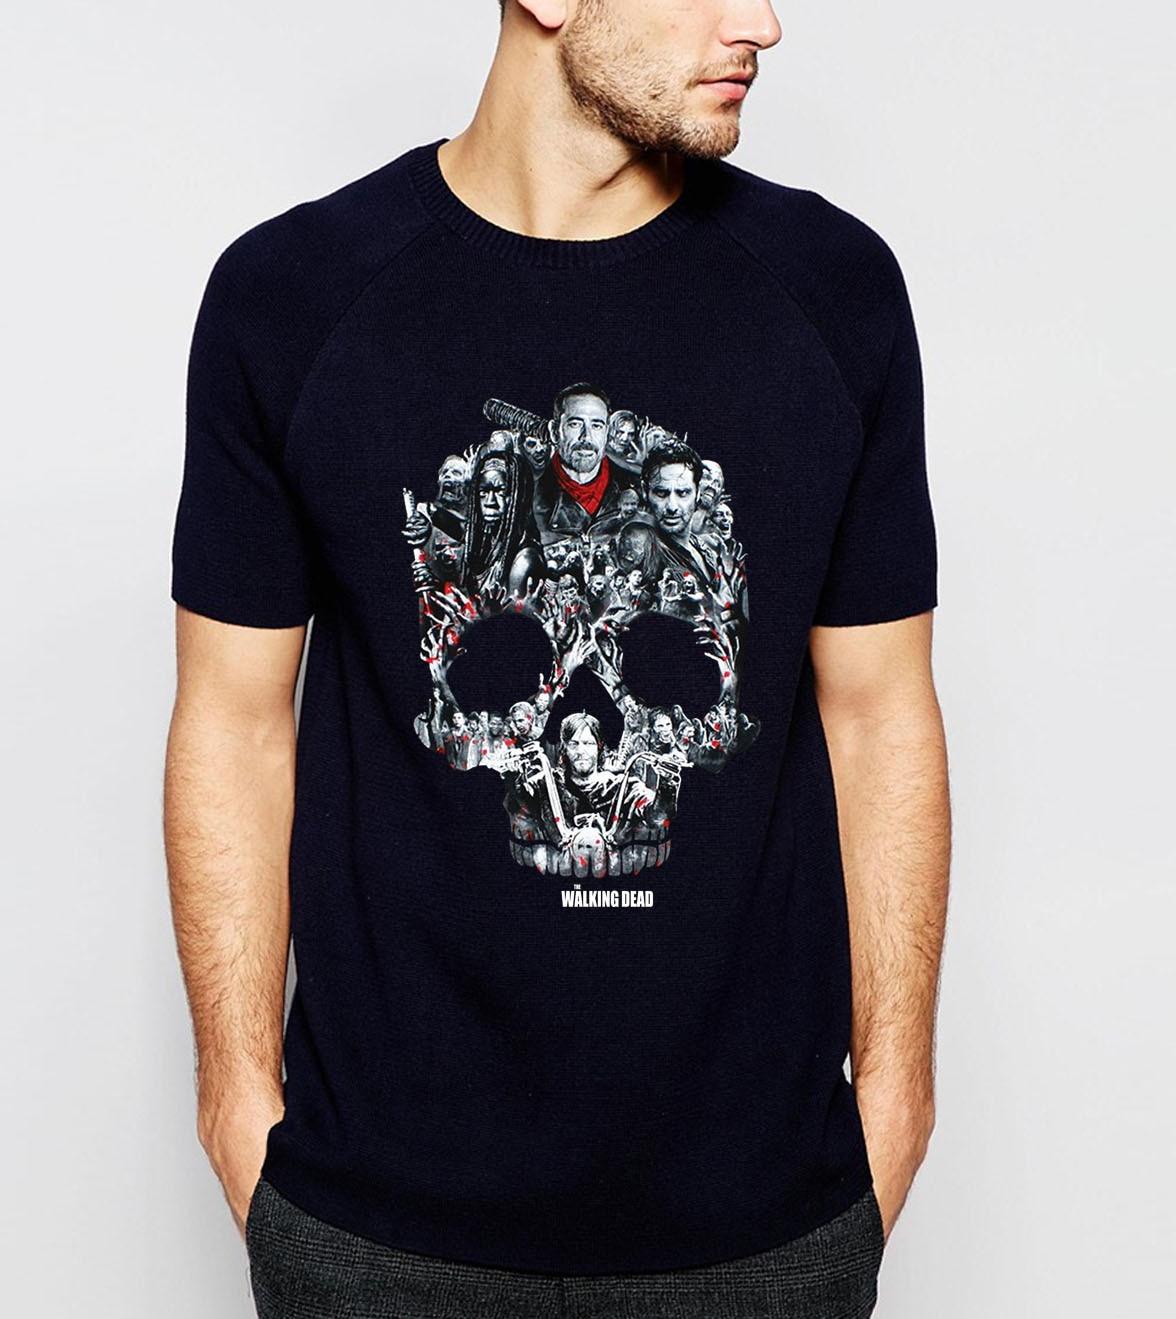 TV Show Skull The Walking Dead Mens Tshirt 2019 Summer Short Sleeve O-Neck Shirt 100% Cotton Men T-Shirt Brand Punk Tee Shirt